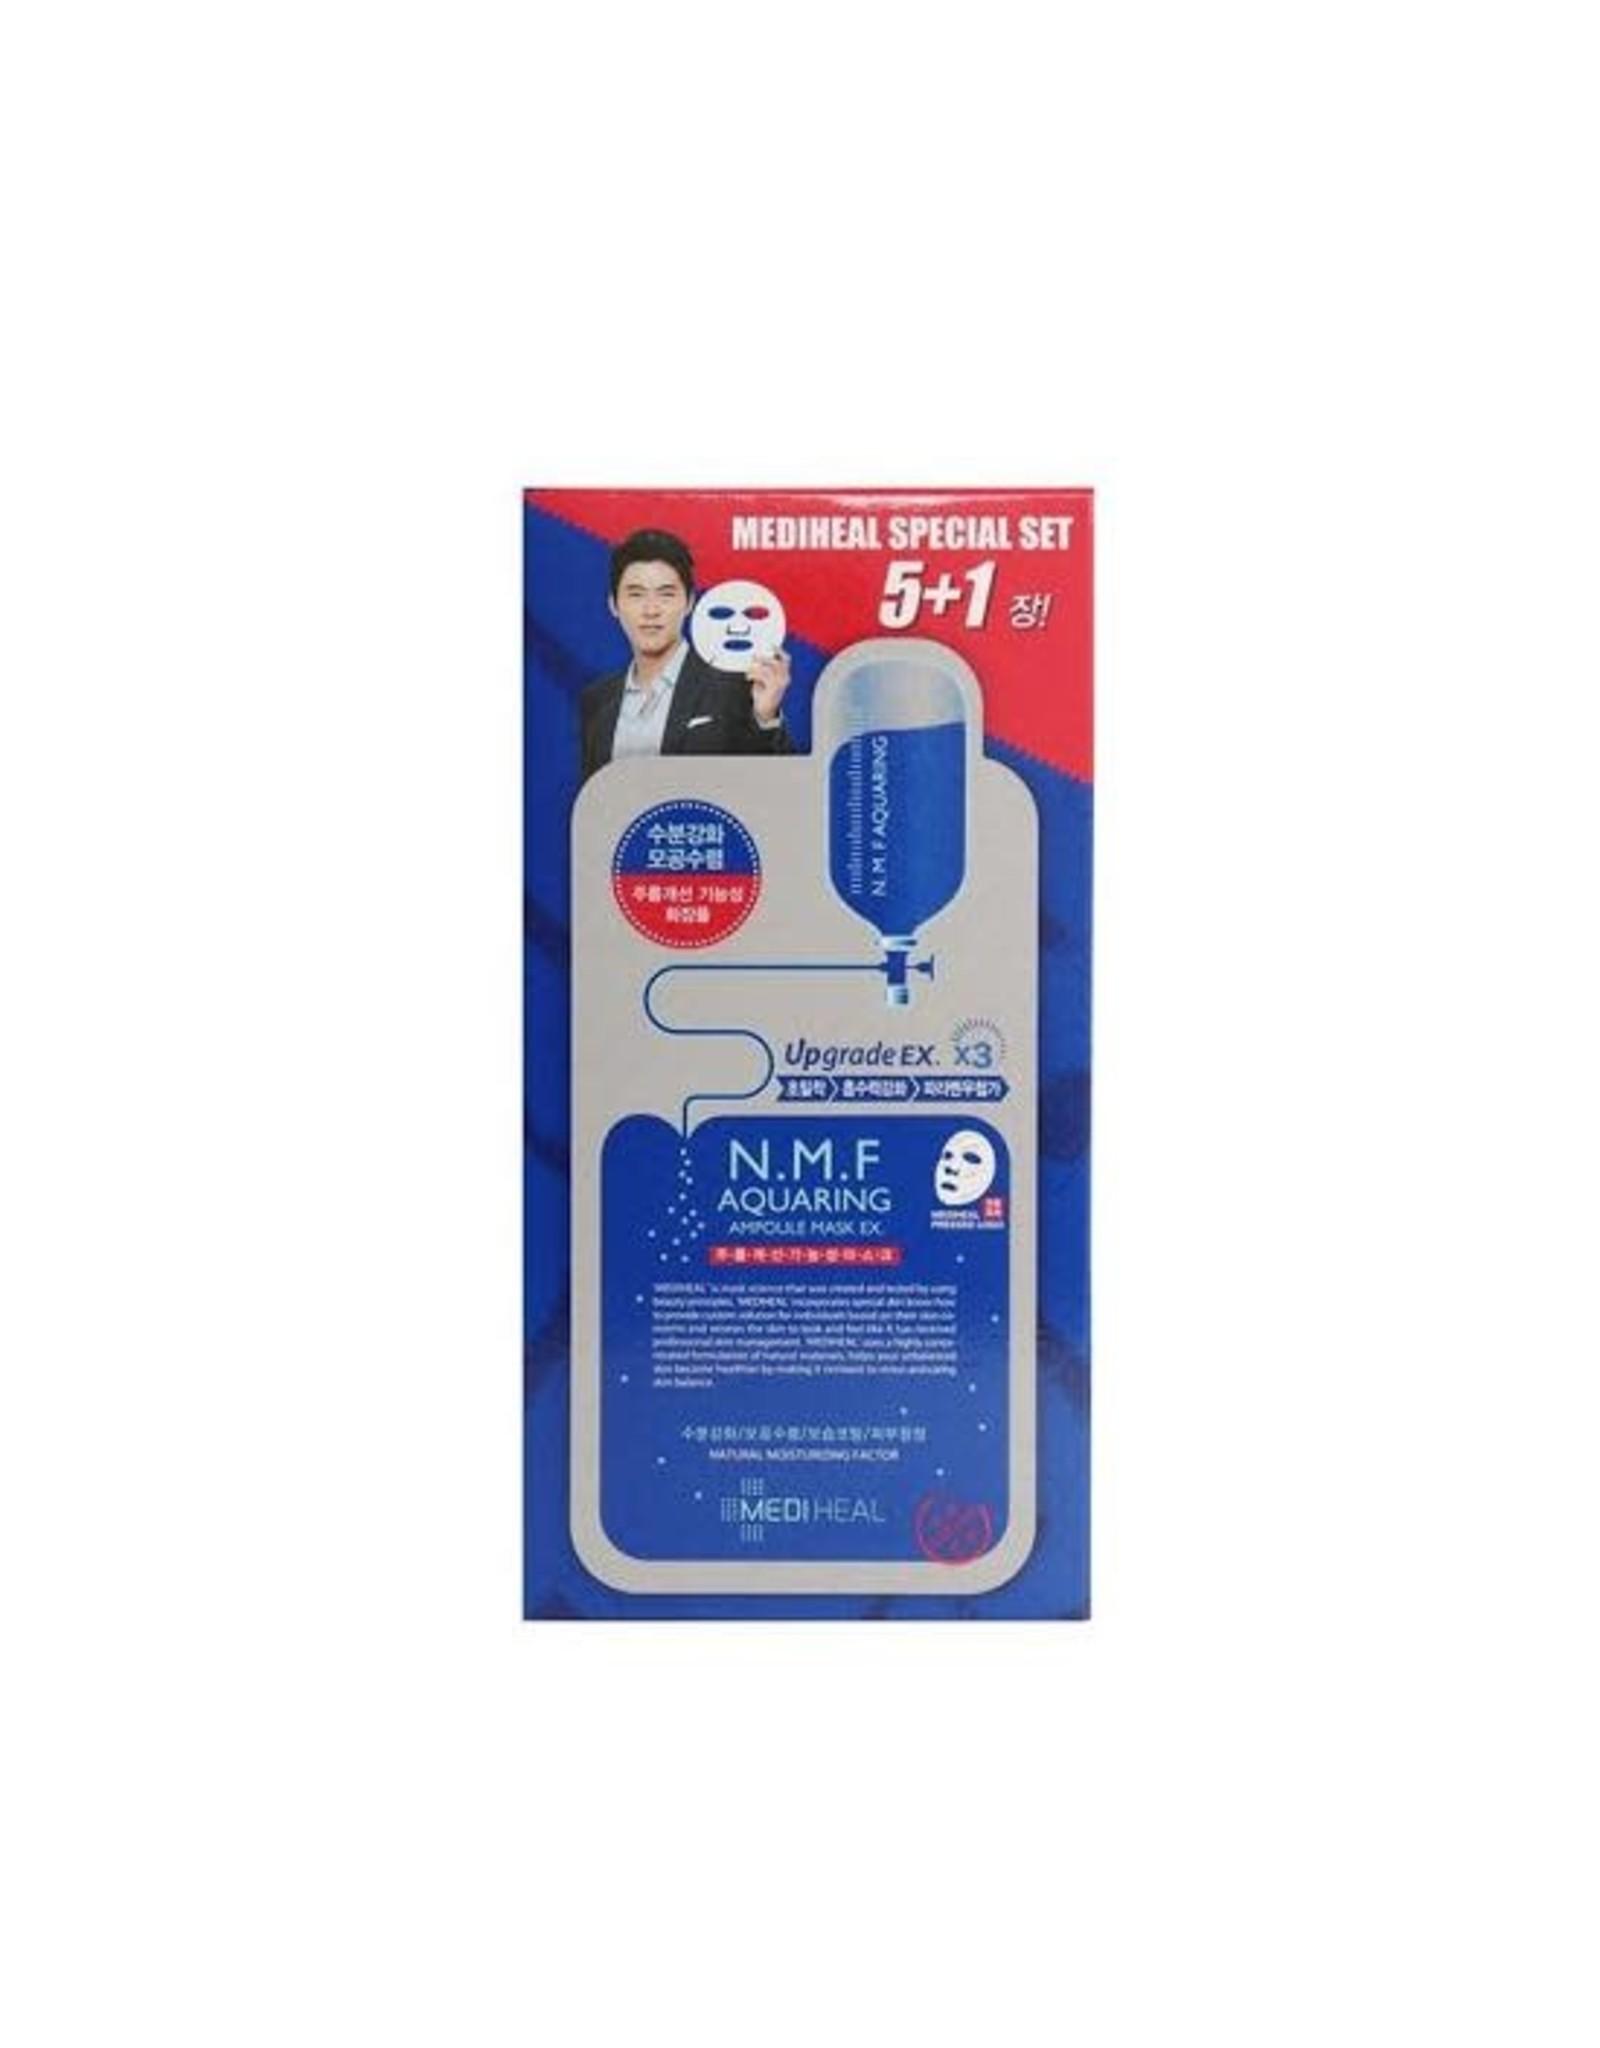 Mediheal Mediheal N.M.F Aquaring Ampoule Mask Limited Edition 5+1